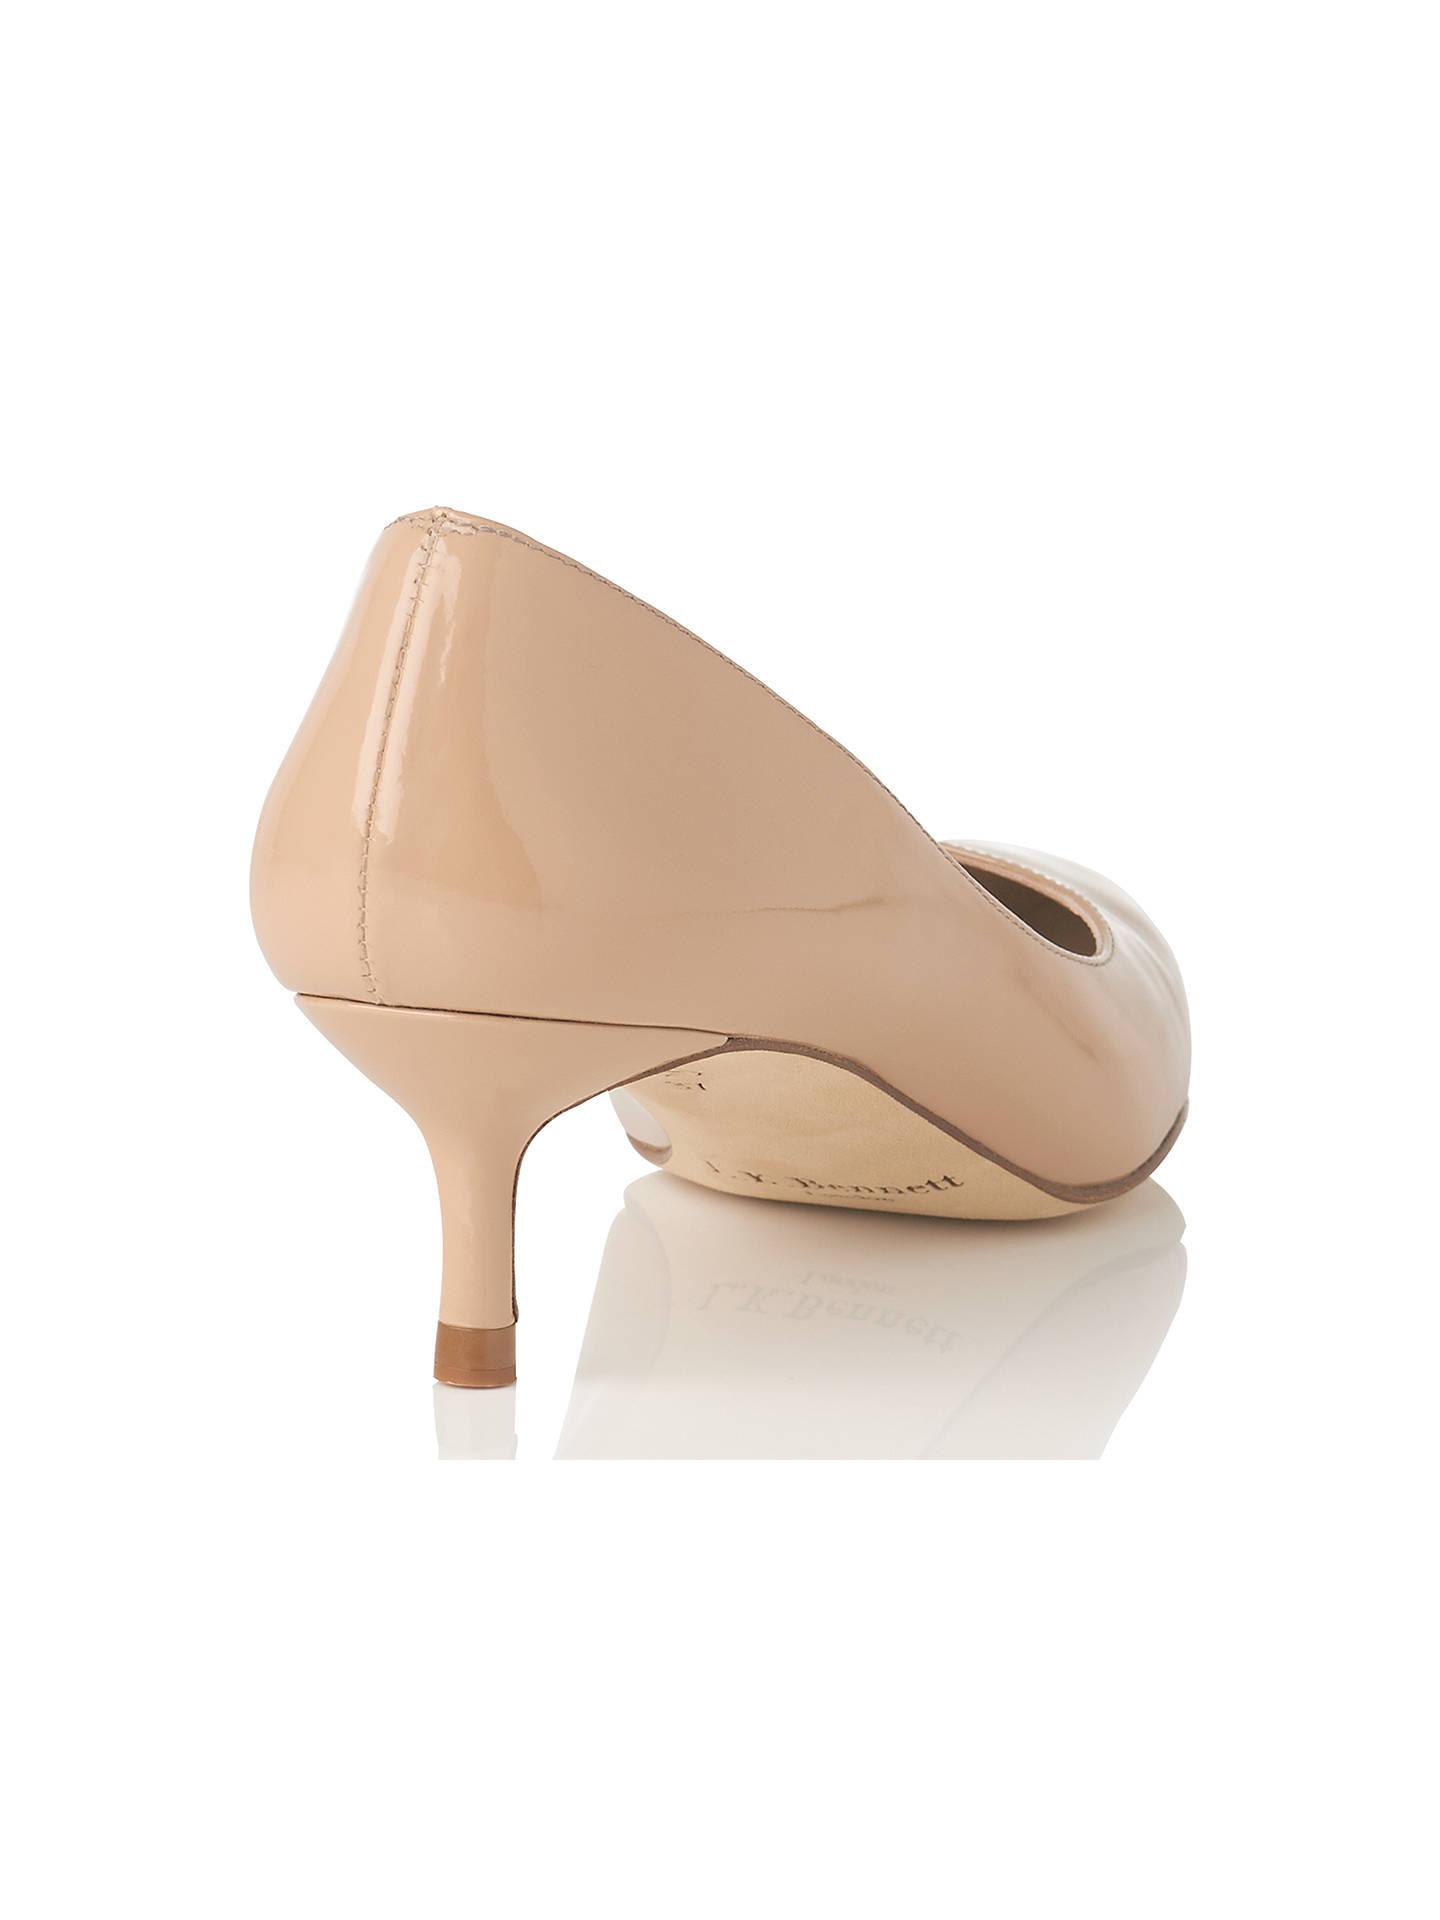 93106b2e425c L.K.Bennett Audrey Pointed Toe Court Shoes at John Lewis   Partners